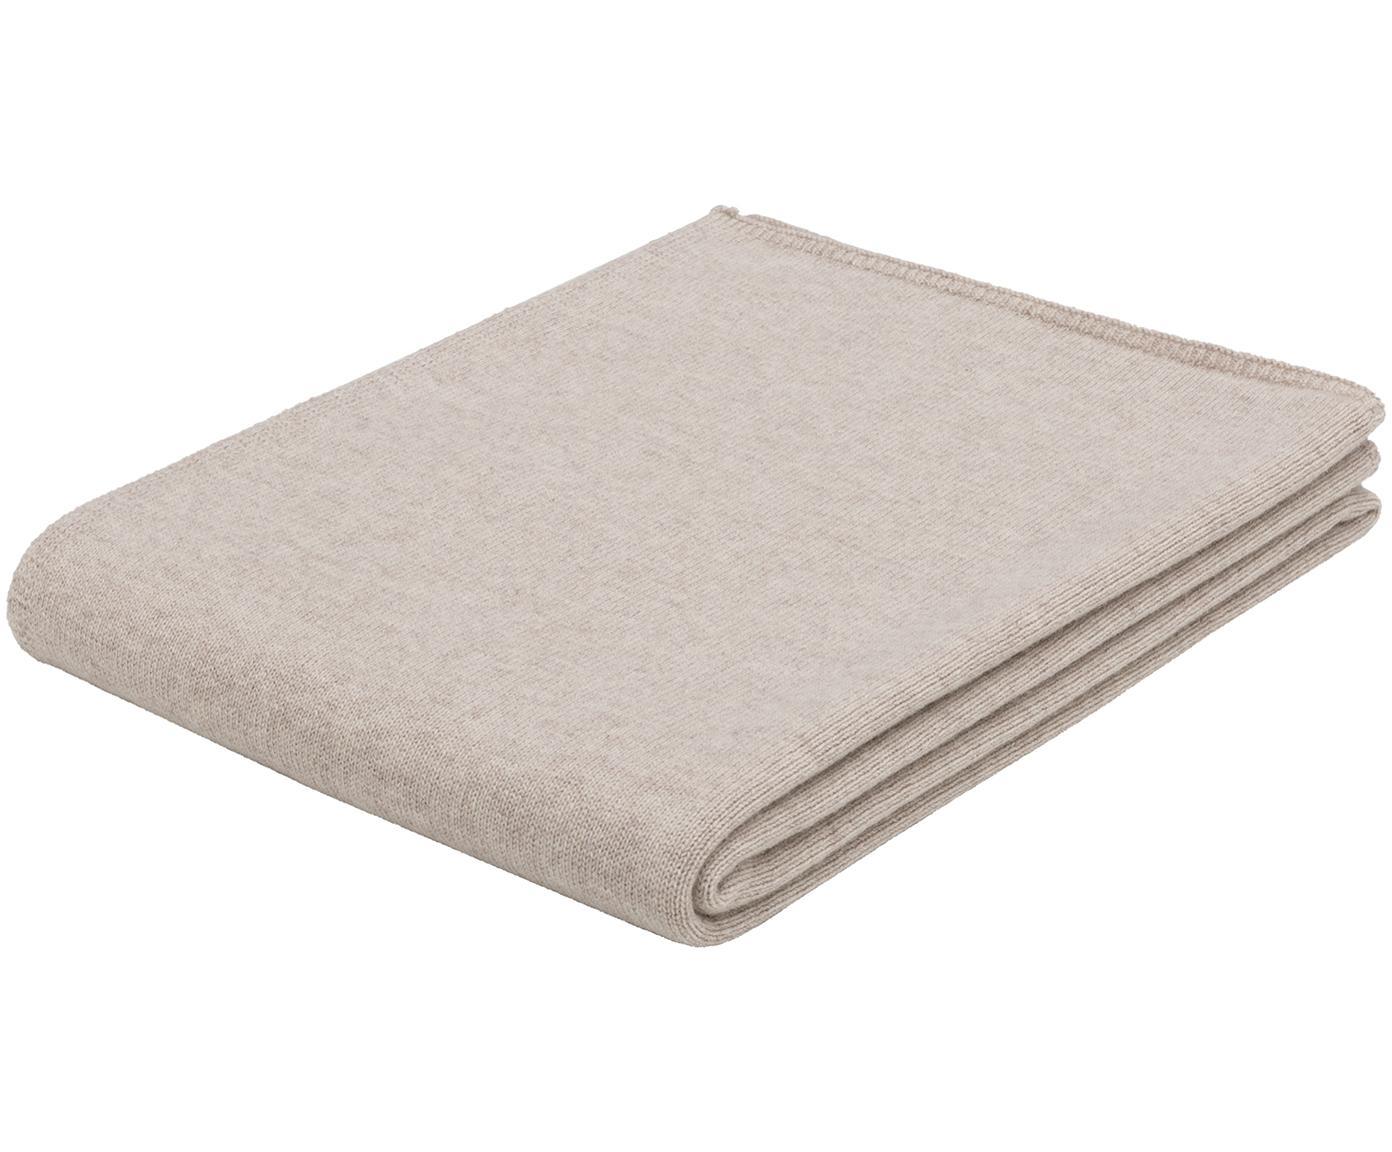 Paid in maglia fine di cashmere Viviana, 70% cashmere, 30% lana merino, Beige, Larg. 130 x Lung. 170 cm